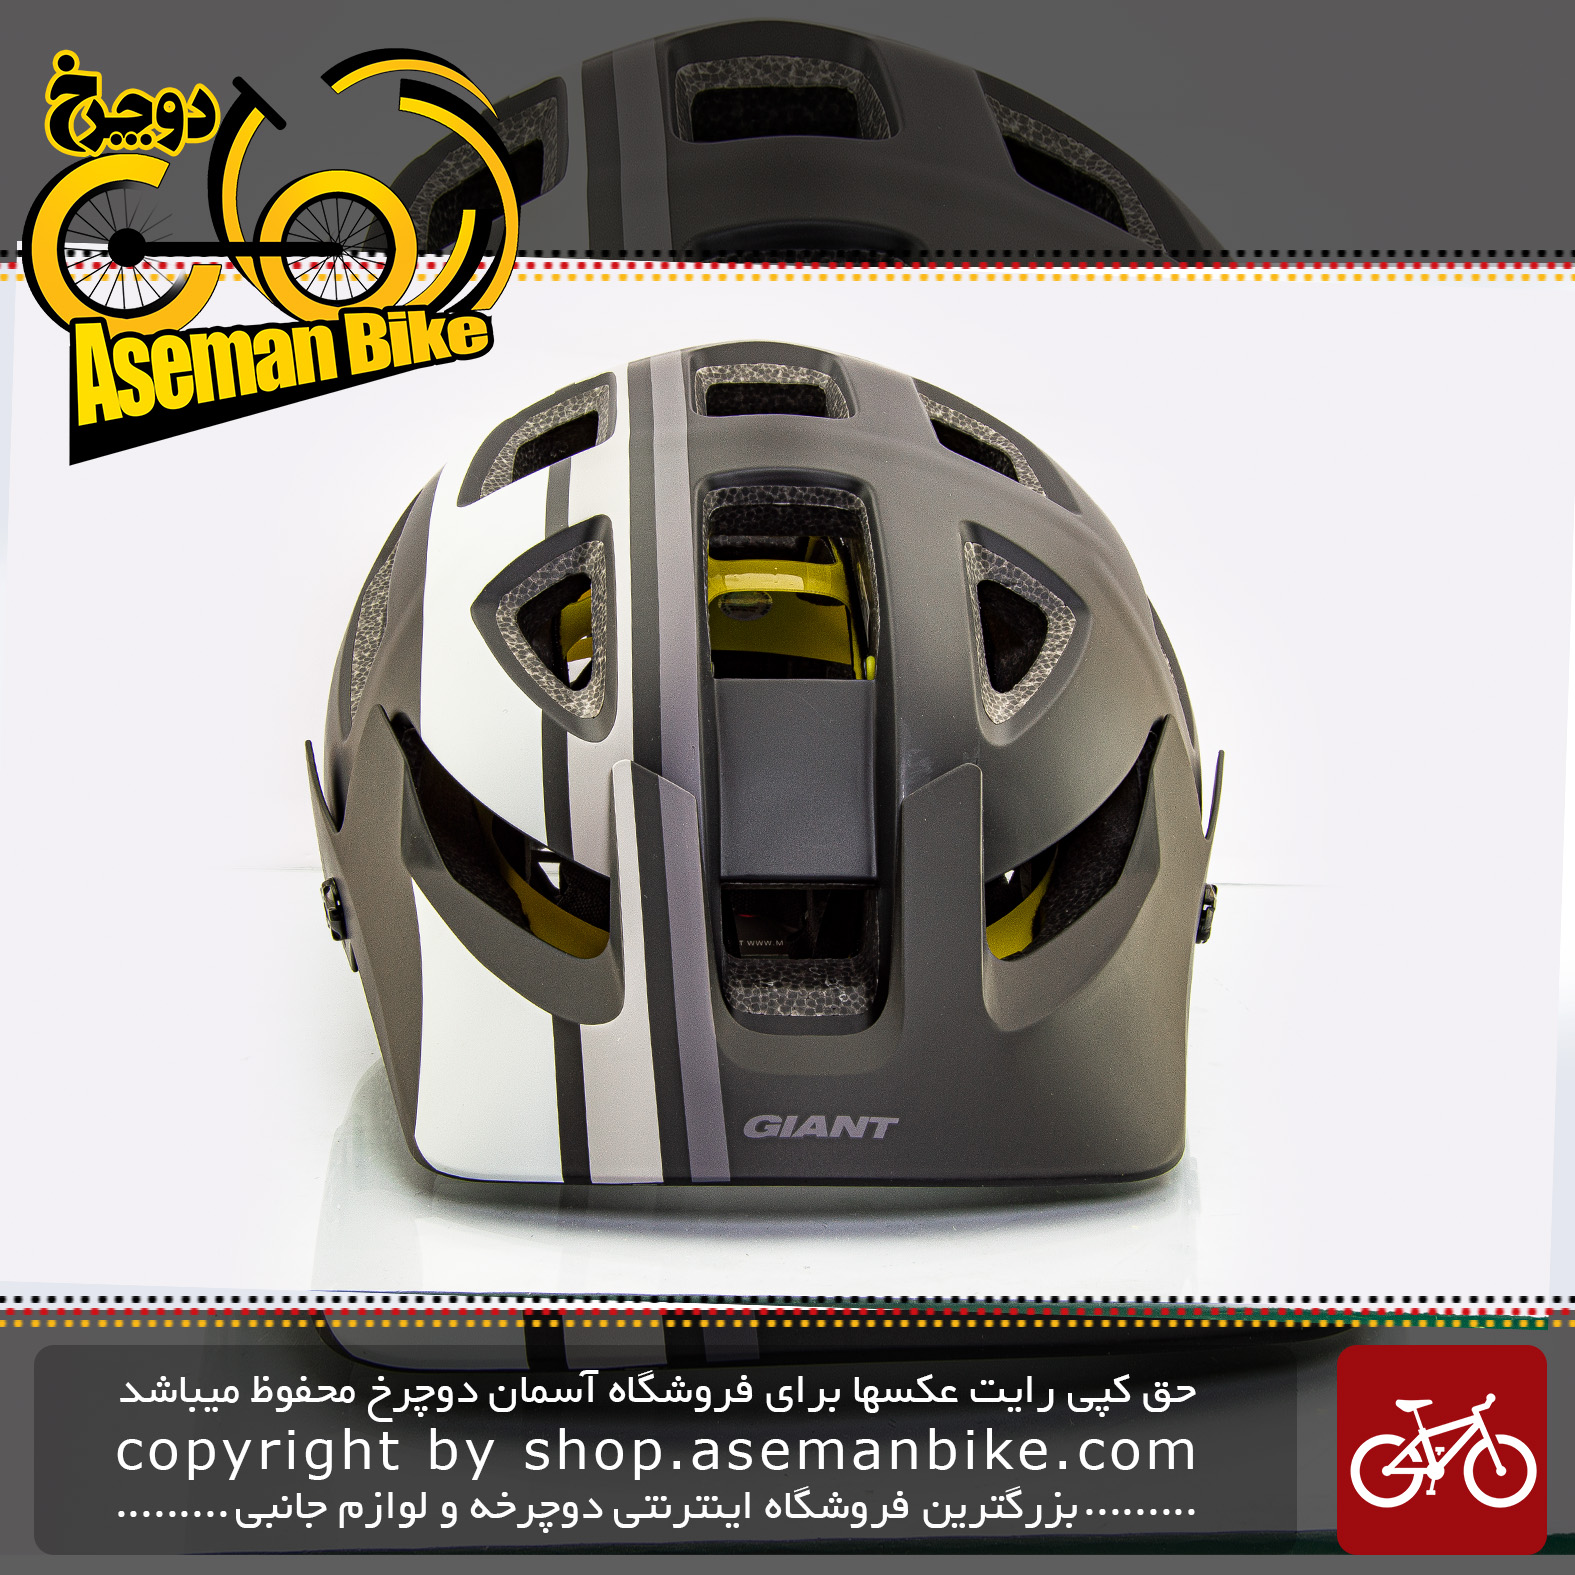 کلاه دوچرخه سواری جاینت مدل ریل میپس مشکی-خاکستری سایز 59-55 Giant Bicycle Helmet Rail Mips Black/Grey size 55-59